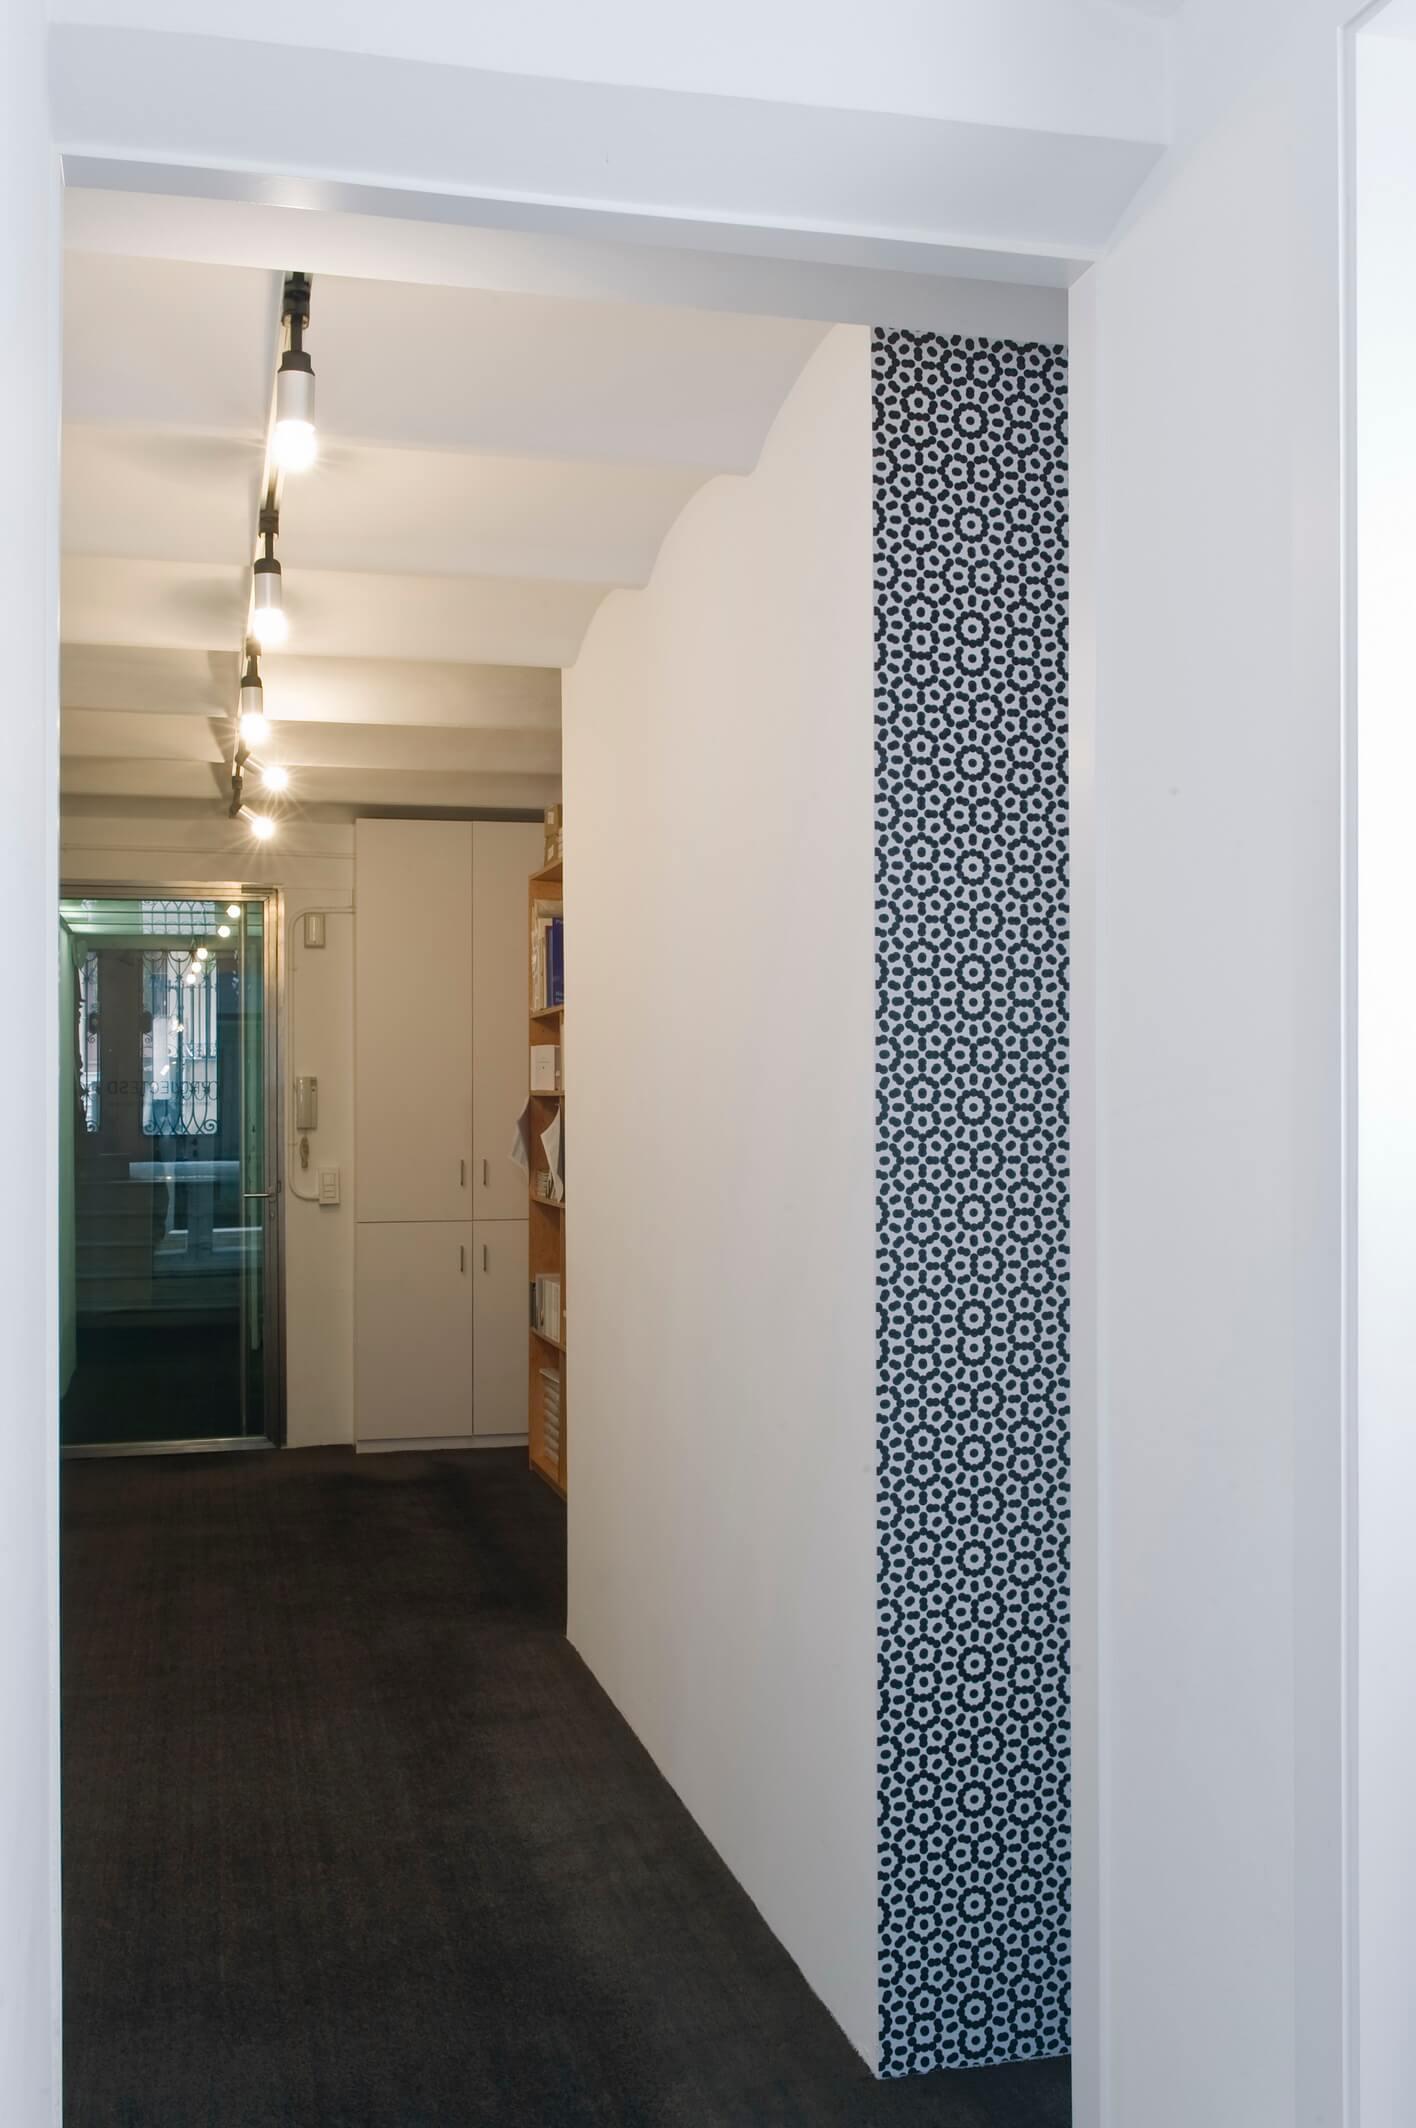 Installation view: Willem Oorebeek:The Umbrella Corner. Chapter 1, ProjecteSD, Barcelona, 2012. | The Umbrella Corner. Chapters 1, 2 and 3 | ProjecteSD